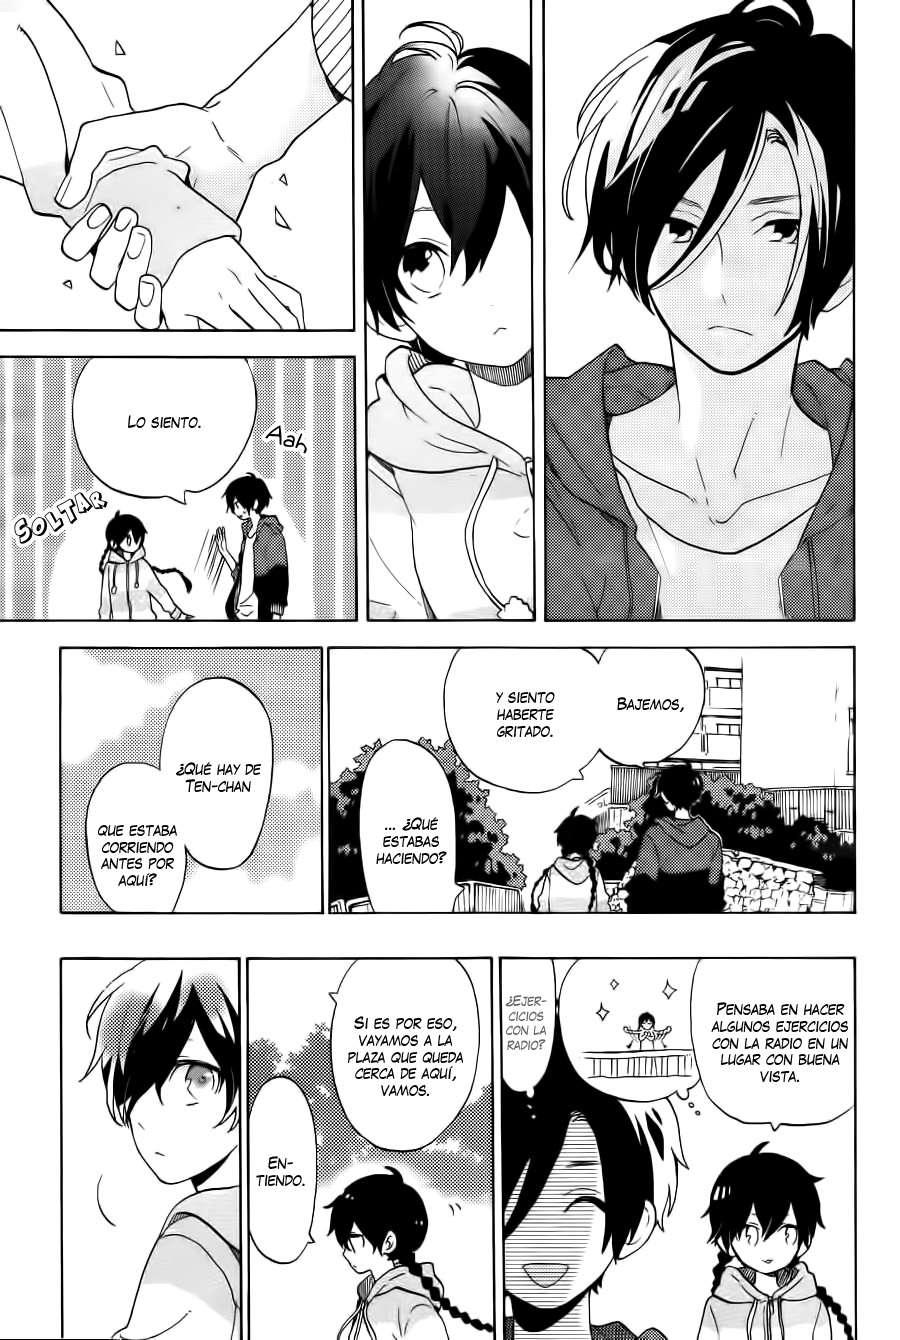 http://c5.ninemanga.com/es_manga/19/18451/442045/f9d826b62995d8bfe6d12ccd4d3b9ffa.jpg Page 5